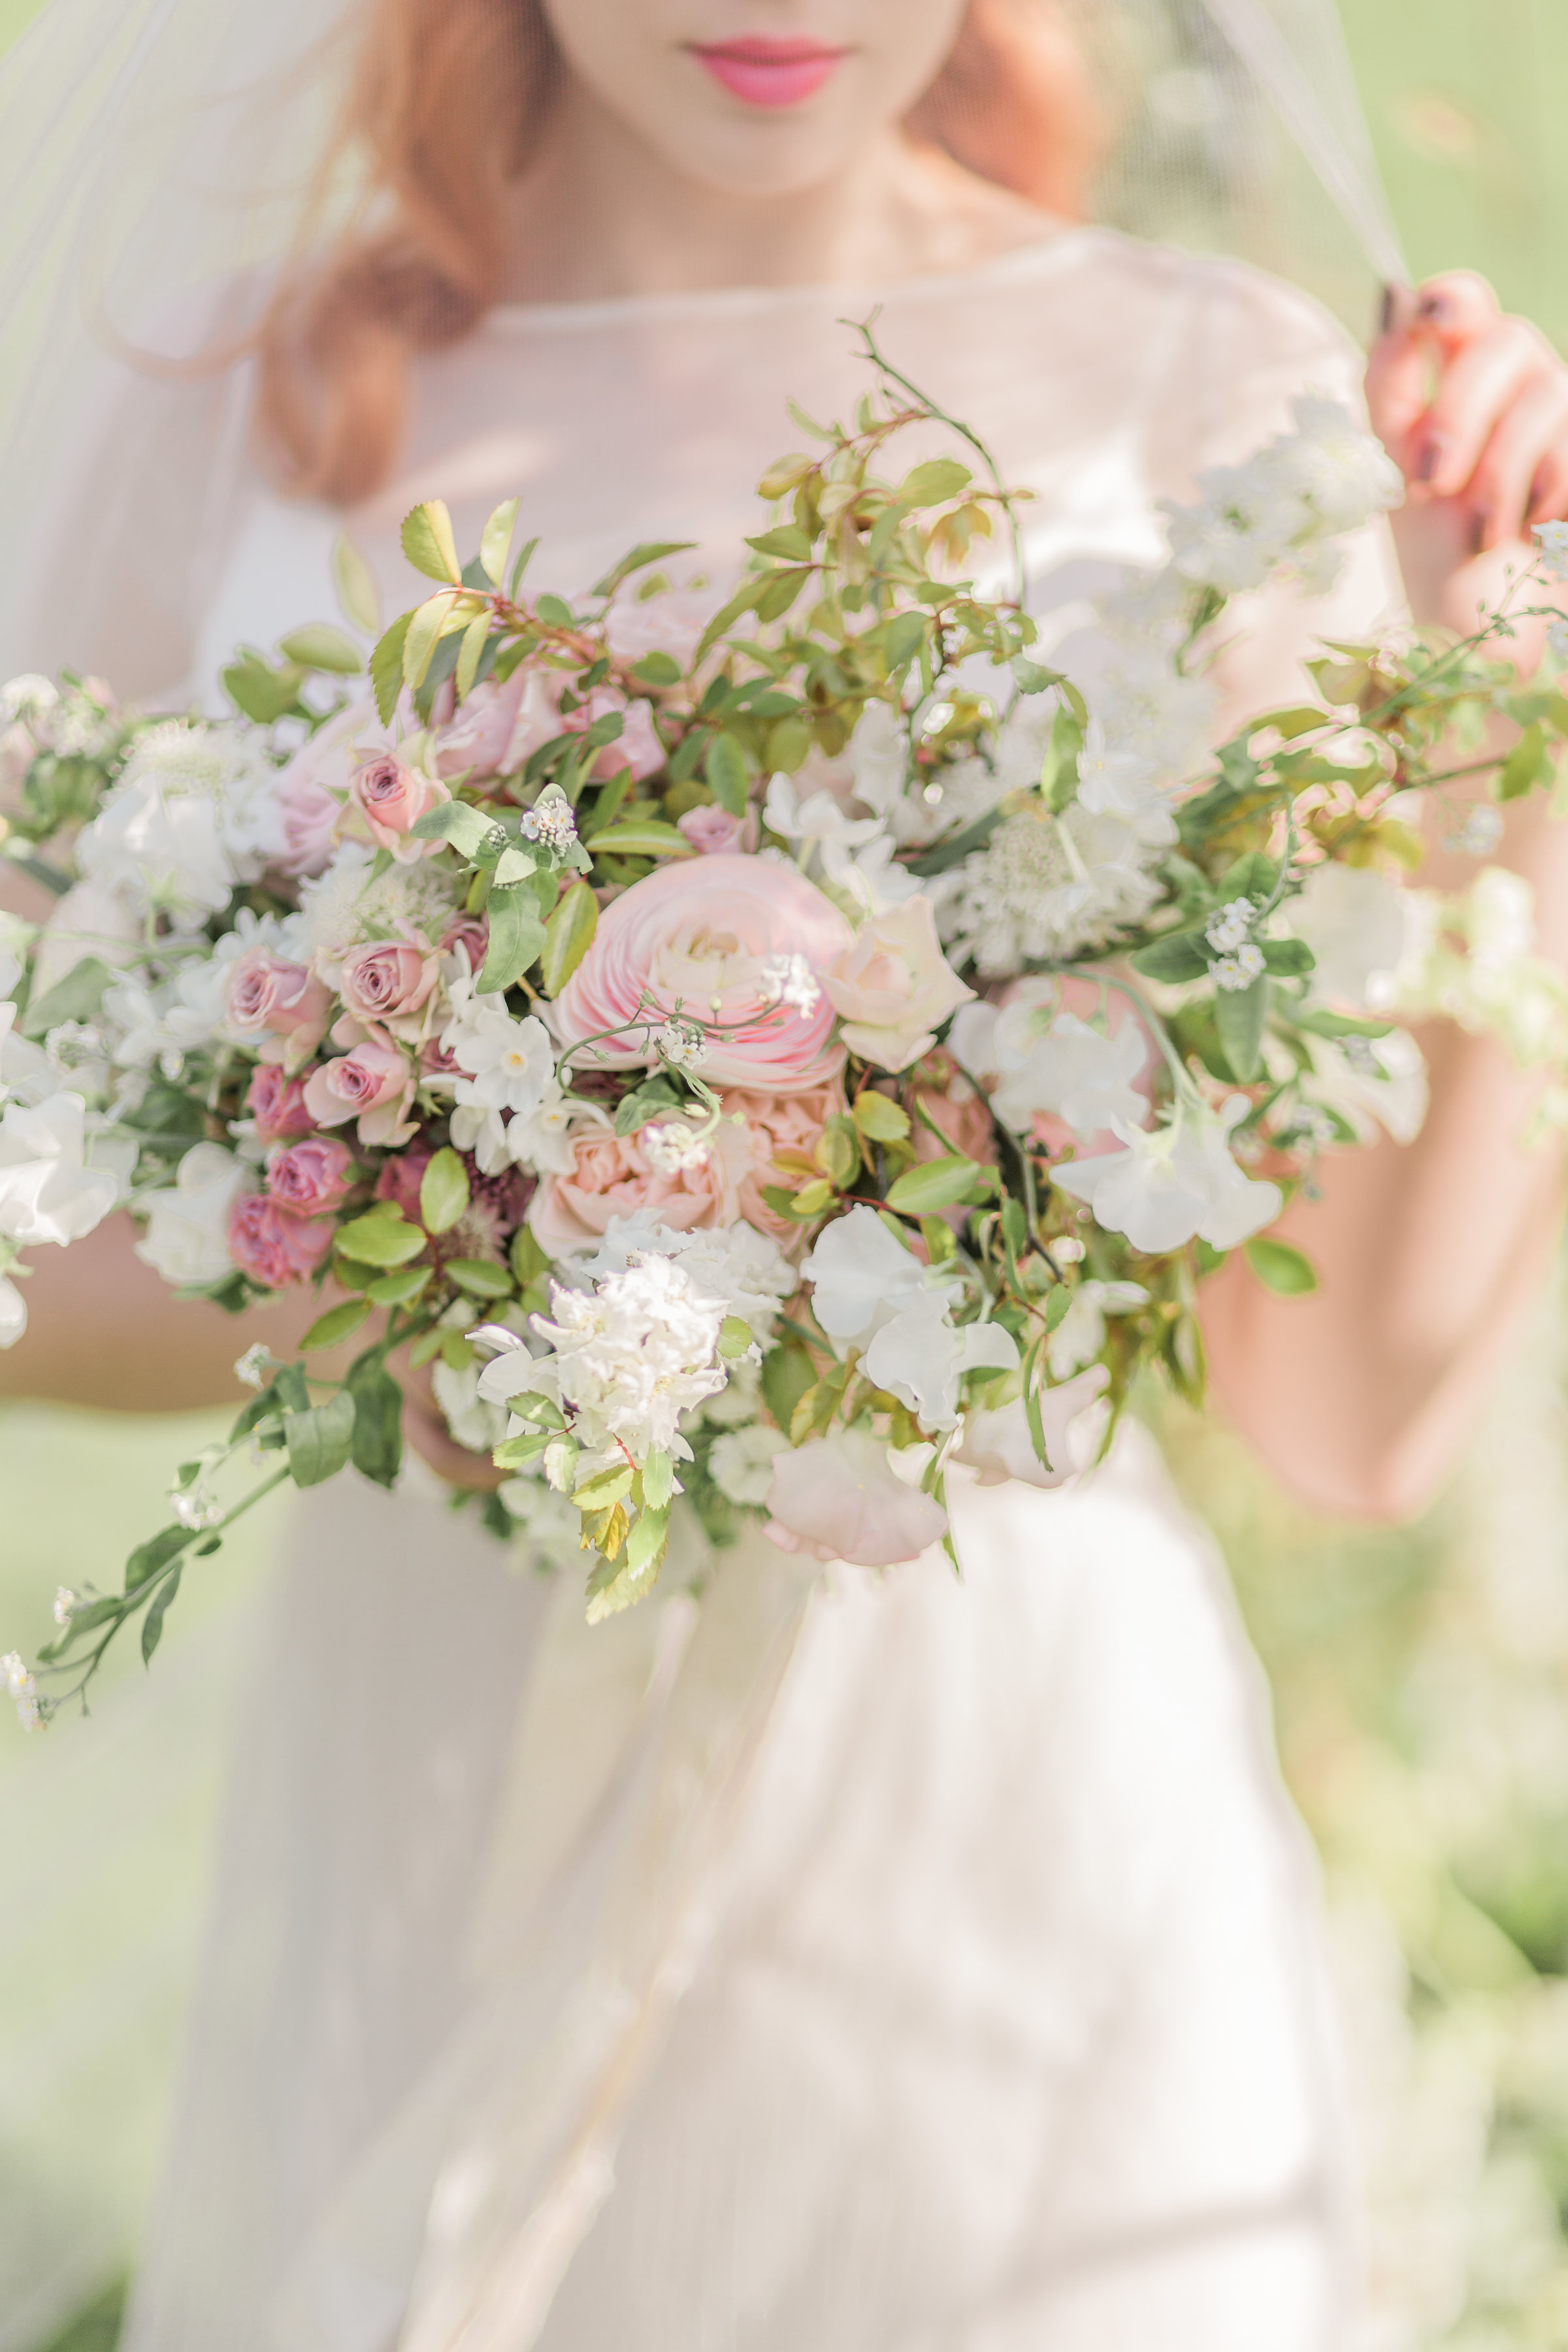 pink ranunculus bouquet by kent flower school jennifer pinder at Chafford Park wedding venue